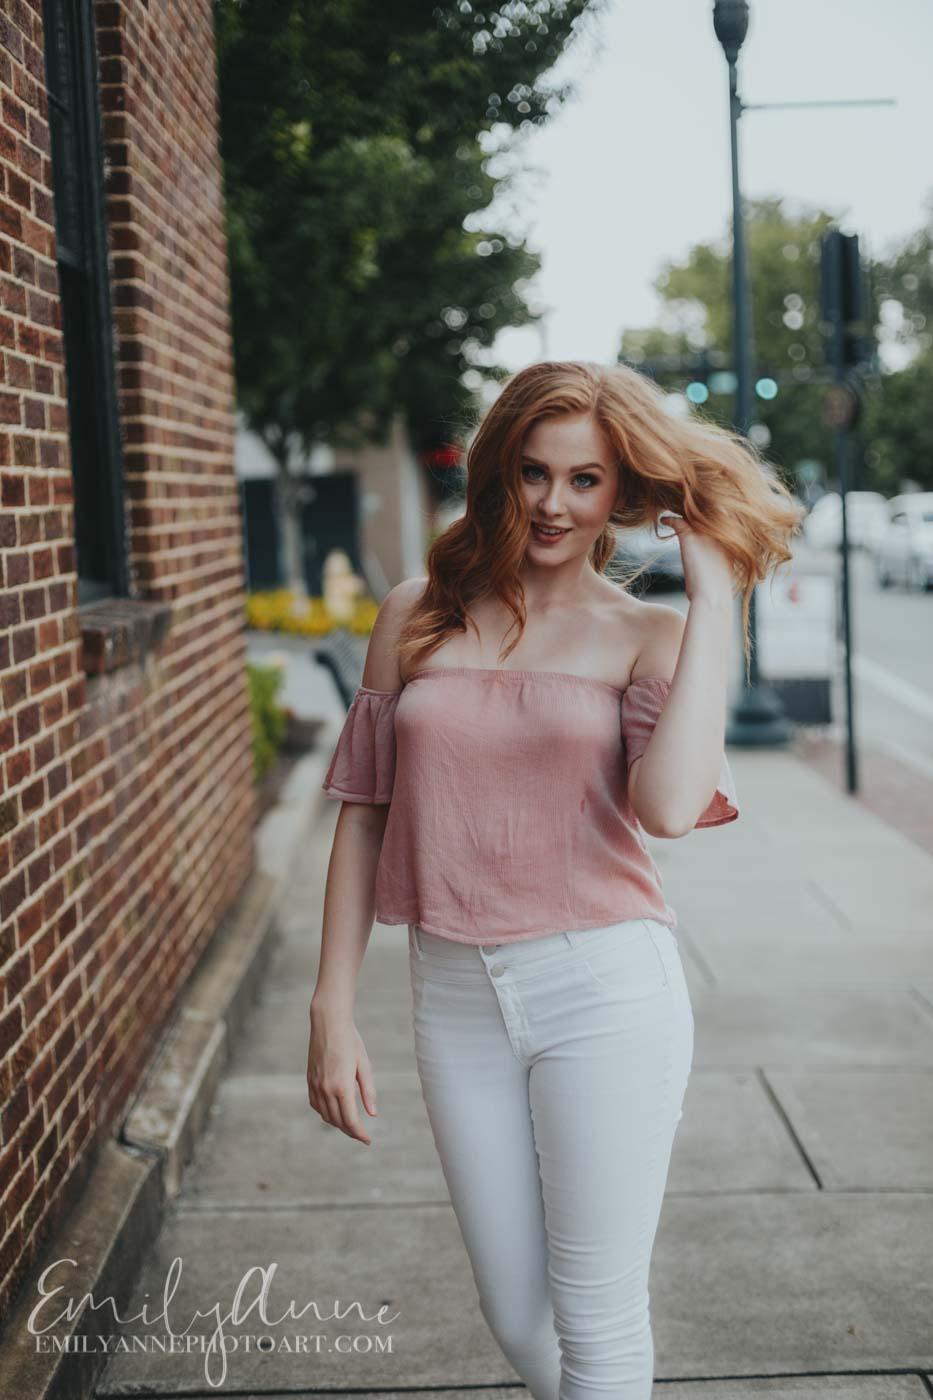 spontaneous candid photoshoot in Nashville TN Emily Anne Photo Art